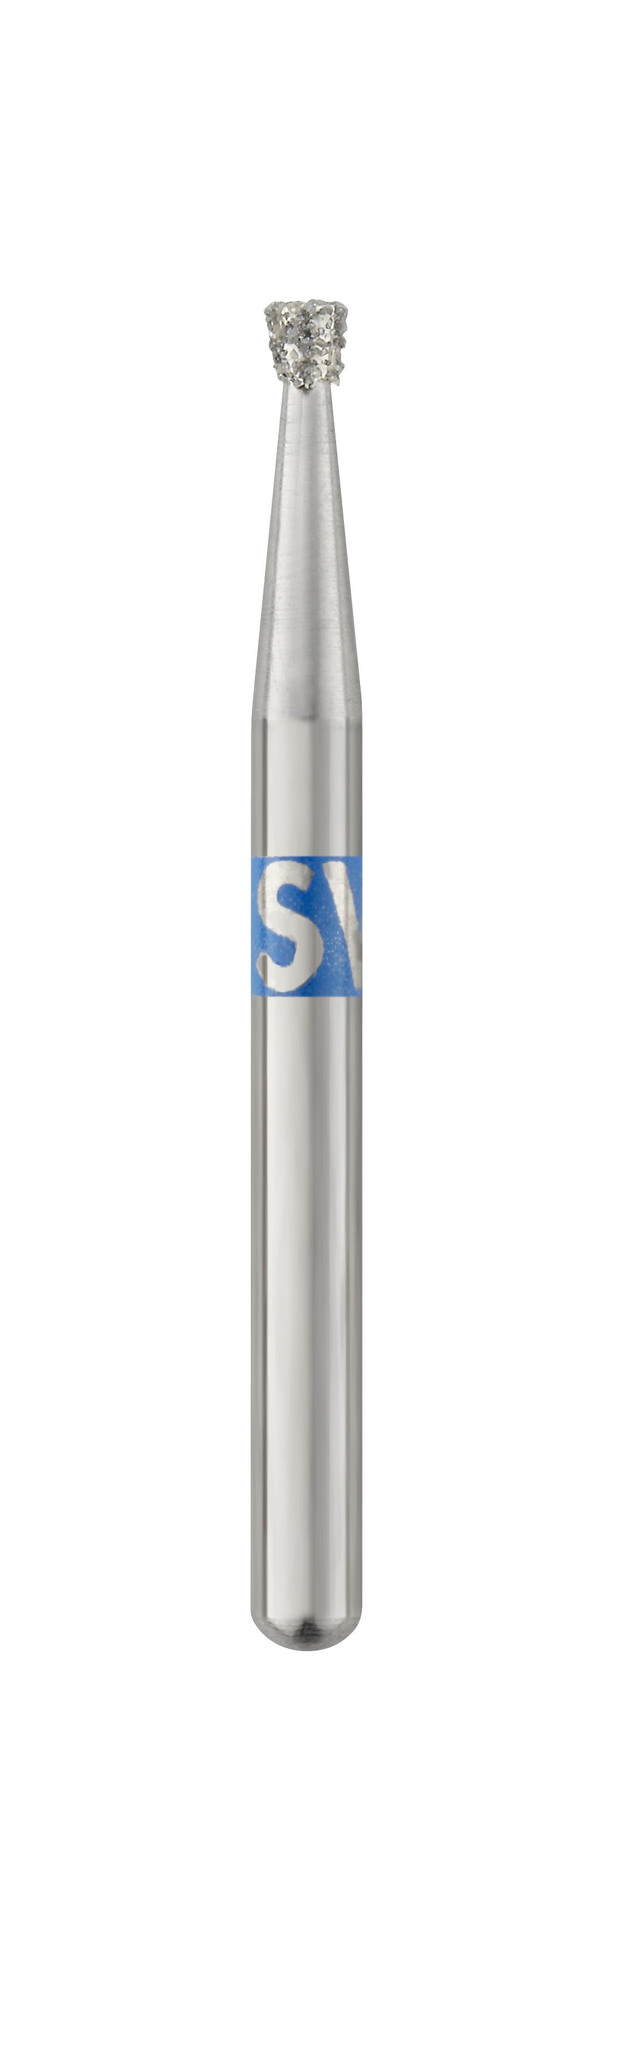 Алмазные боры «SS WHITE» серия HP 805/012